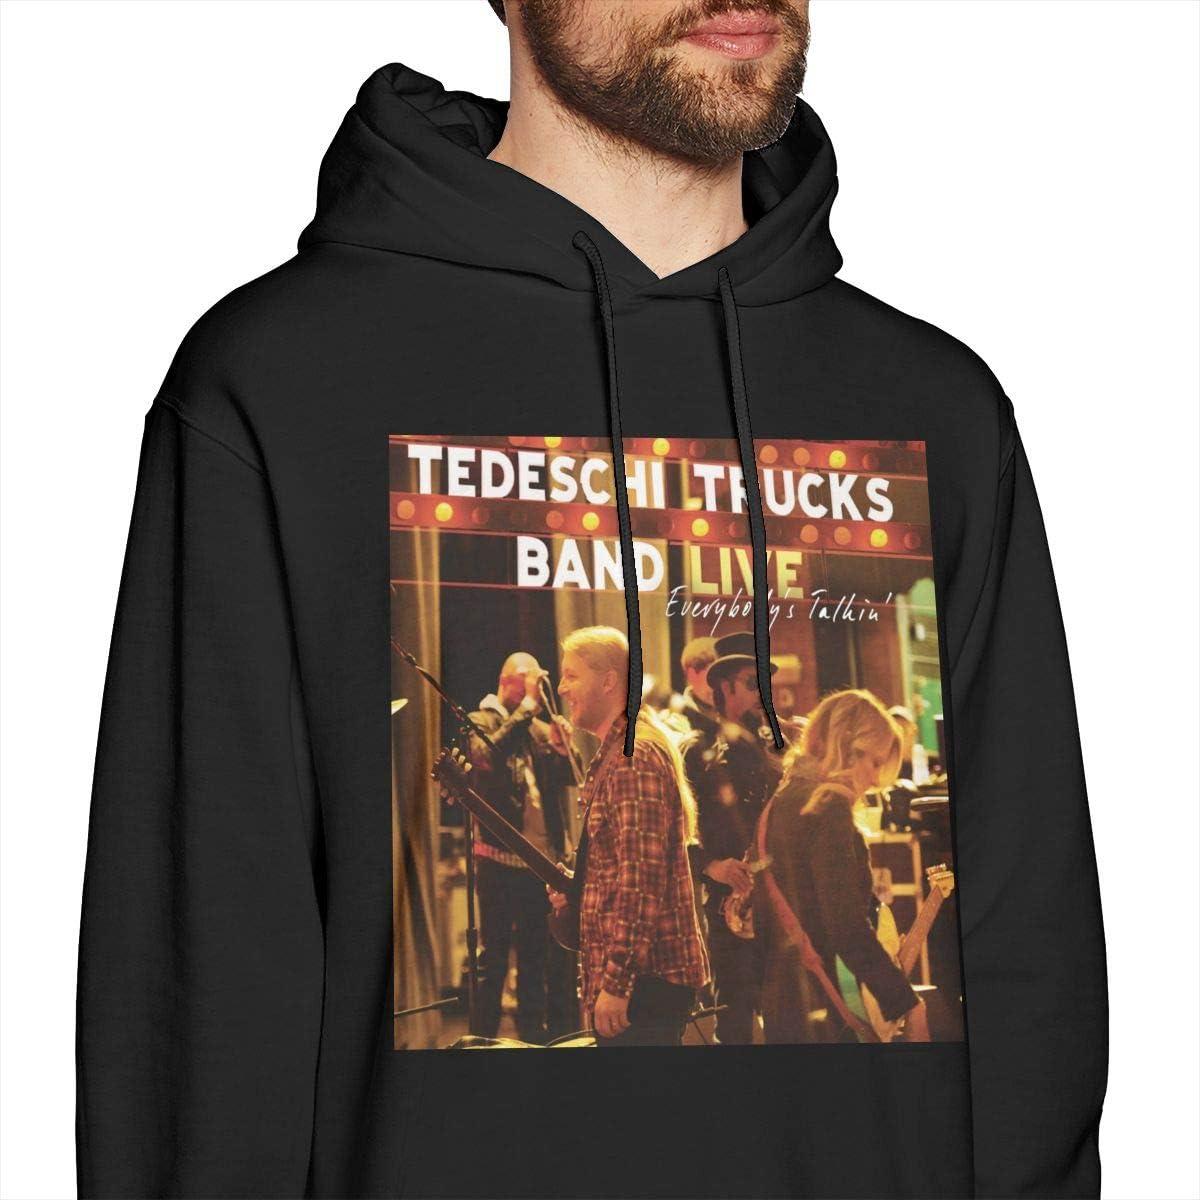 NOAH MAHMOOD Tedeschi Trucks Music Band Sweatshirts for Men Hoodies Black